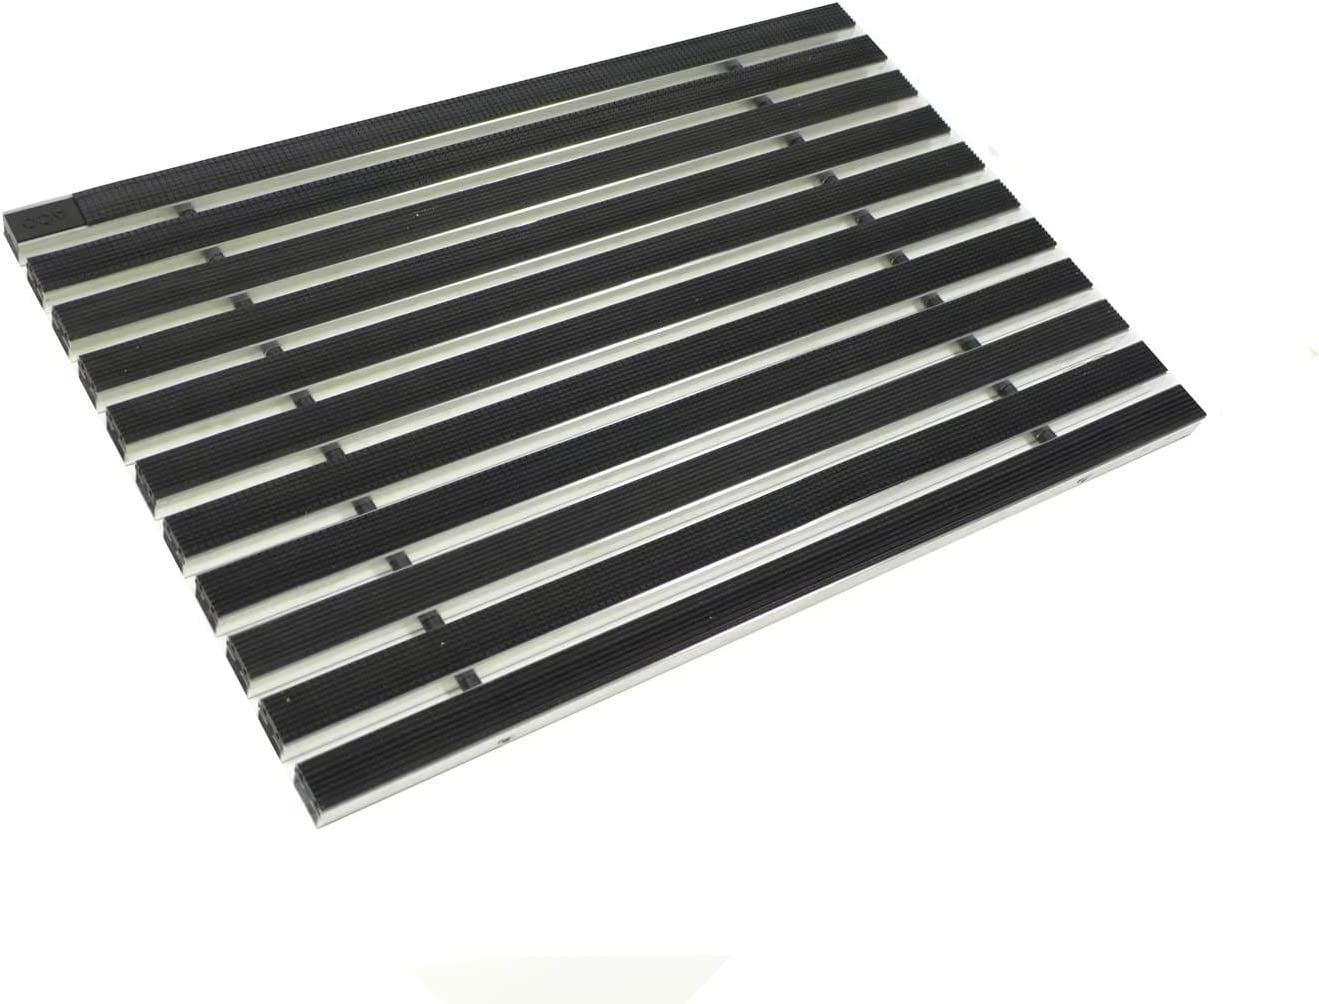 ACO Eingangsmatte 75x50 Gummi schwarz mit ALU Winkelrahmen Fu/ßmatte T/ürmatte Abstreifer